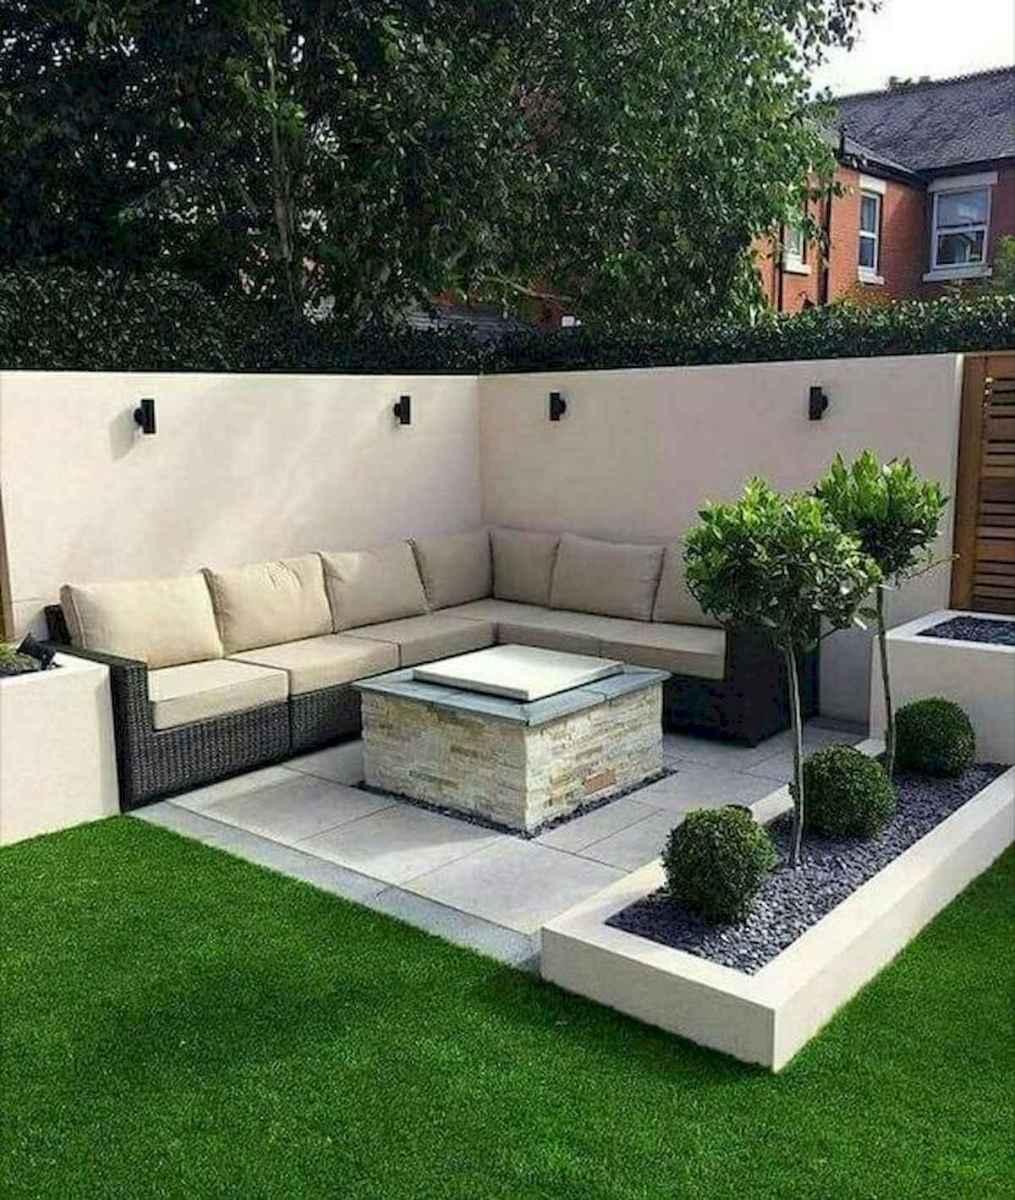 25 Creative Sunken Sitting Areas For a Mesmerizing Backyard Landscape (4)